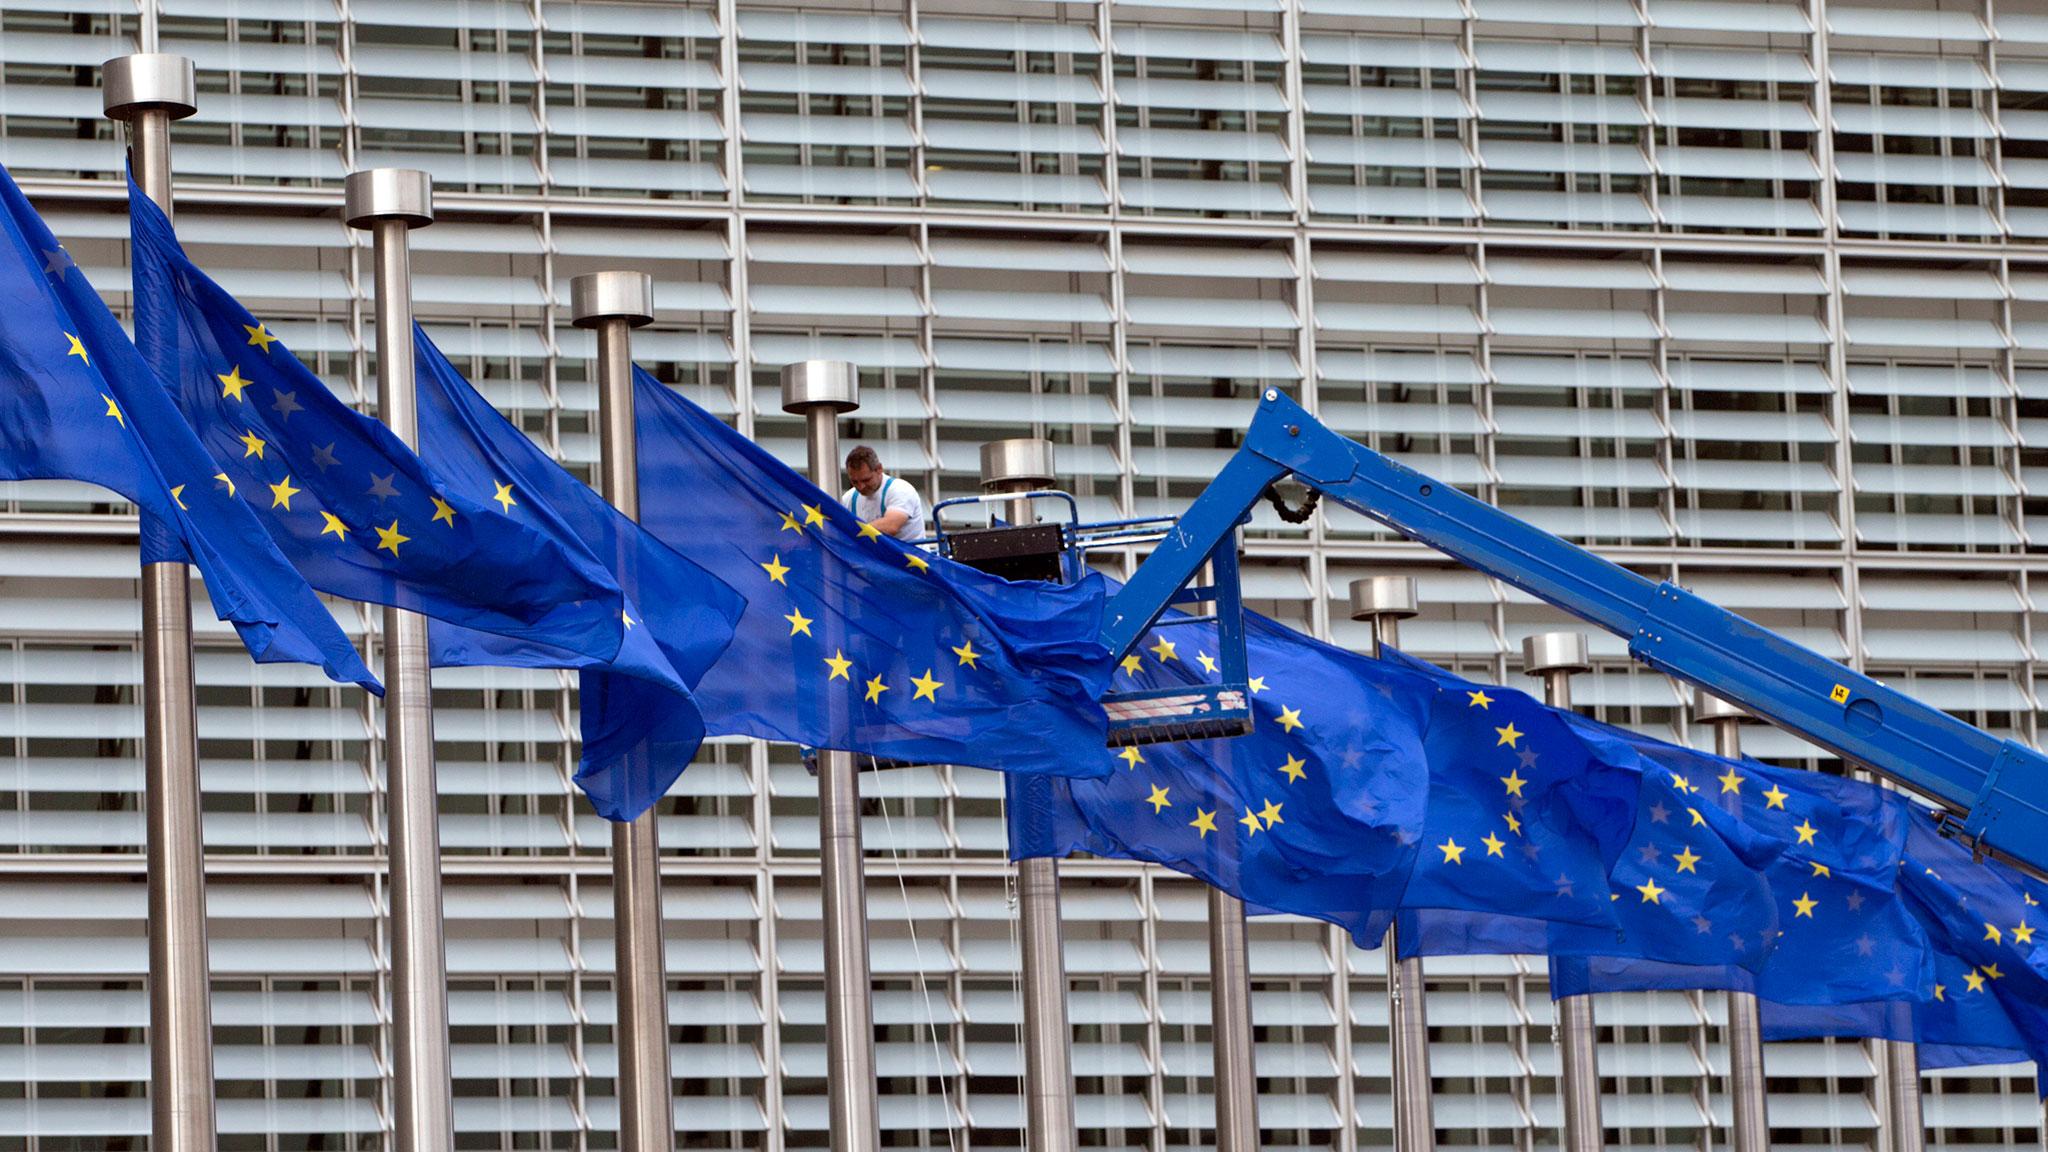 US tech warns Netherlands over tax regime | Financial Times